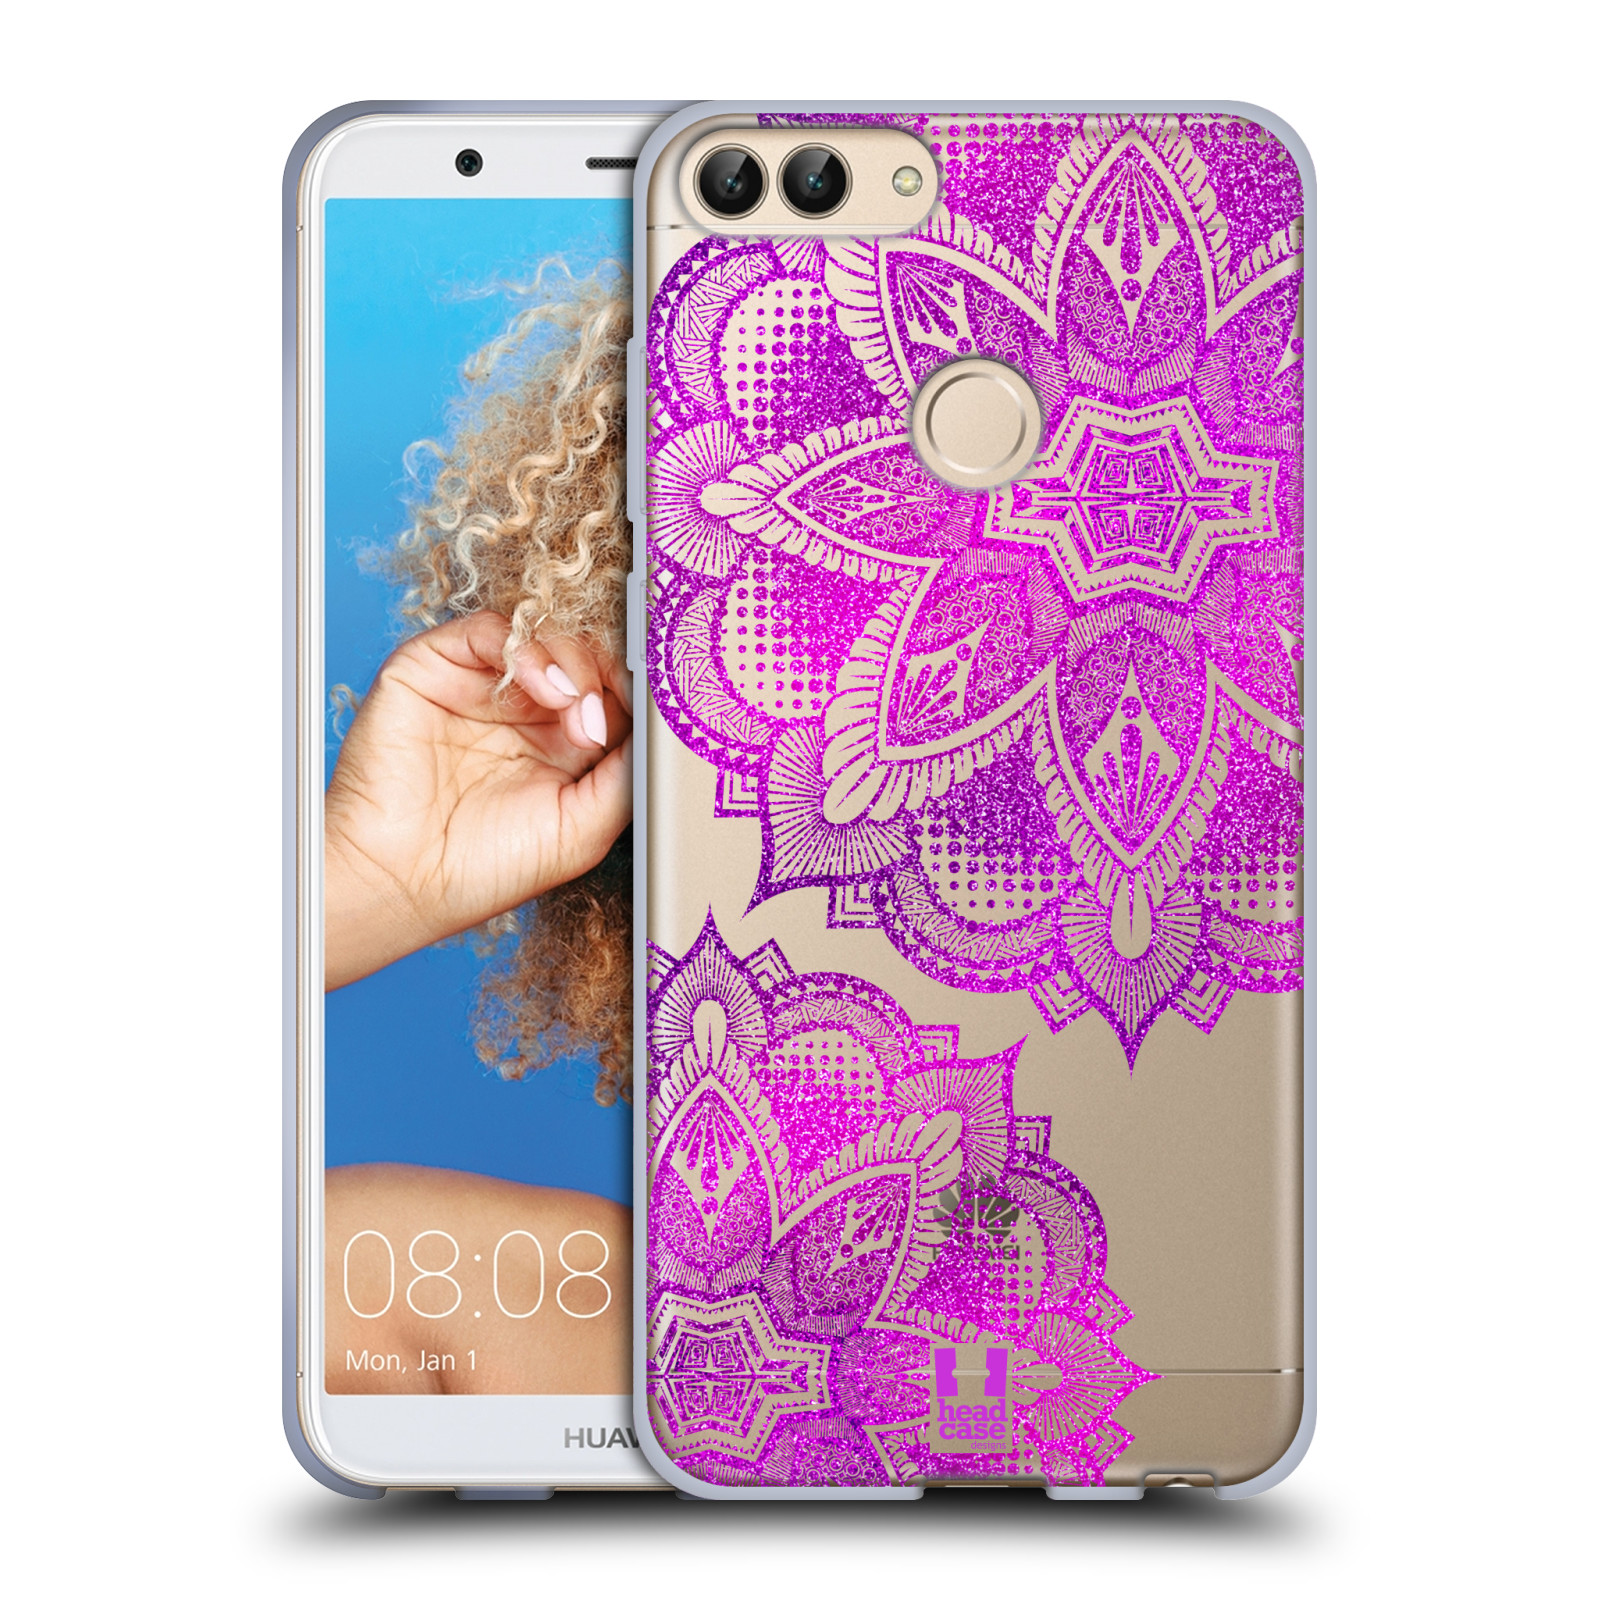 Silikonové pouzdro na mobil Huawei P Smart - Head Case - Fialová mandala